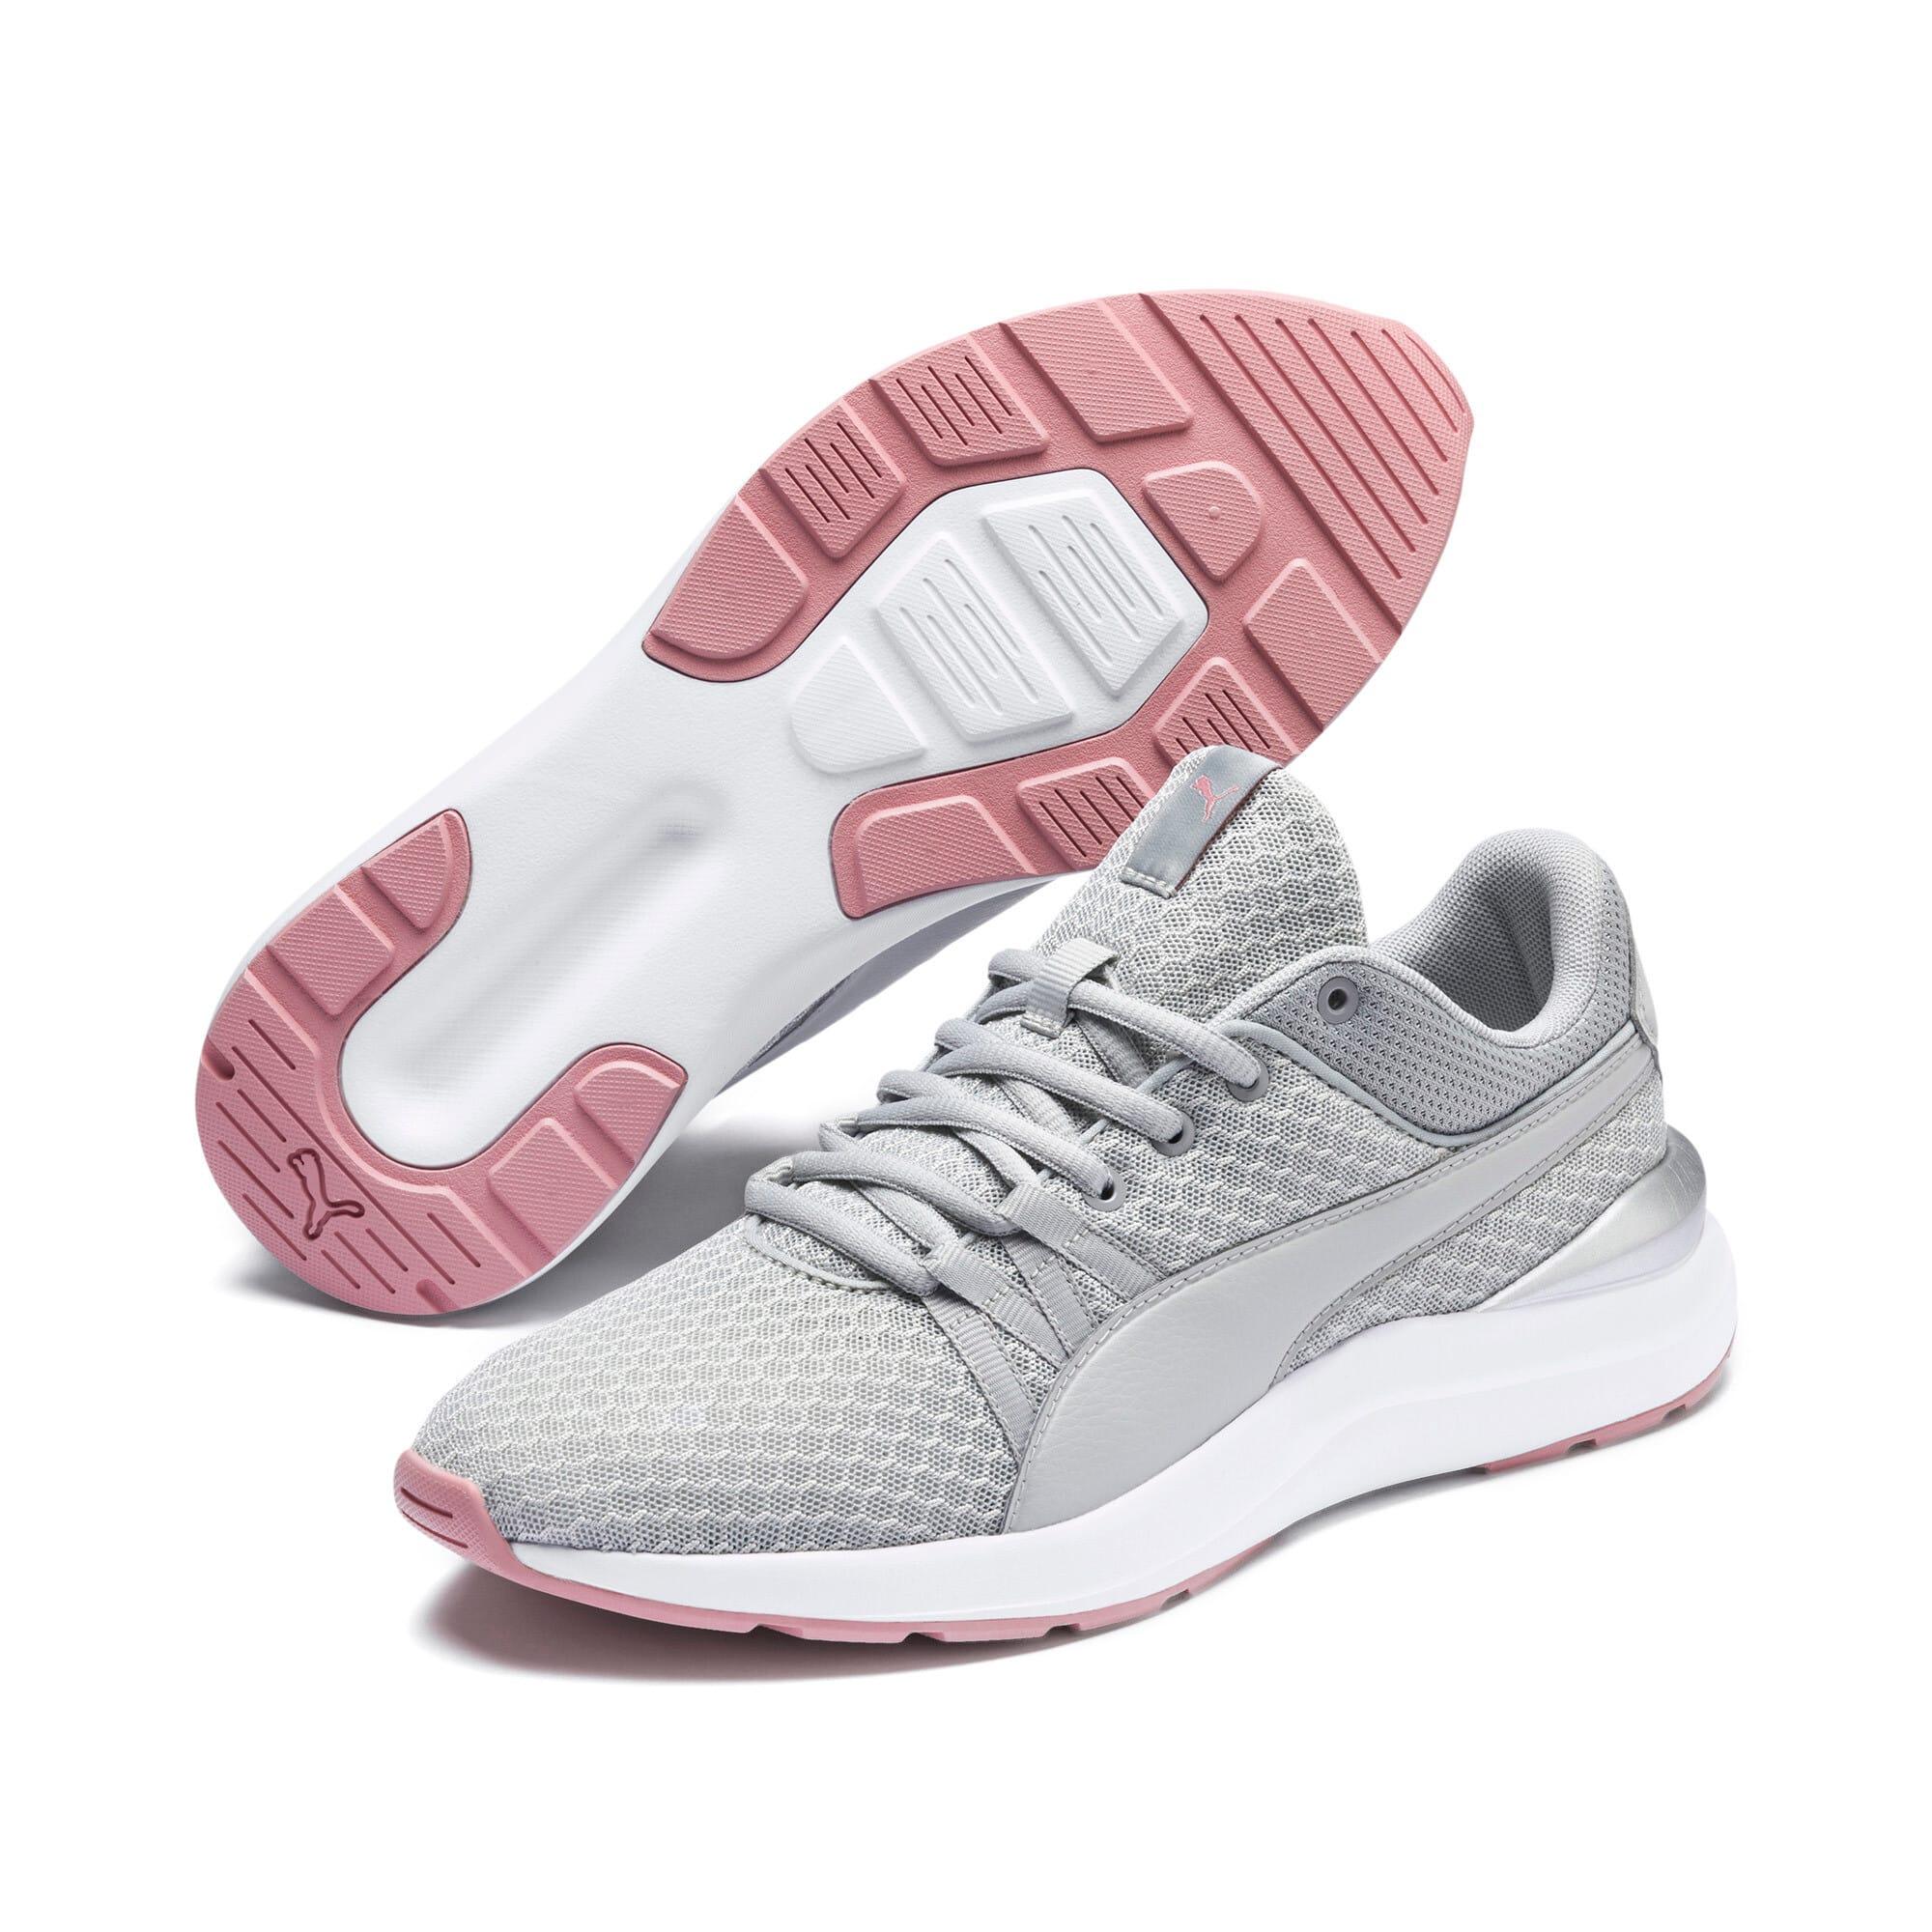 Thumbnail 3 of Adela Core Women's Sneakers, Gray Violet-Puma Silver, medium